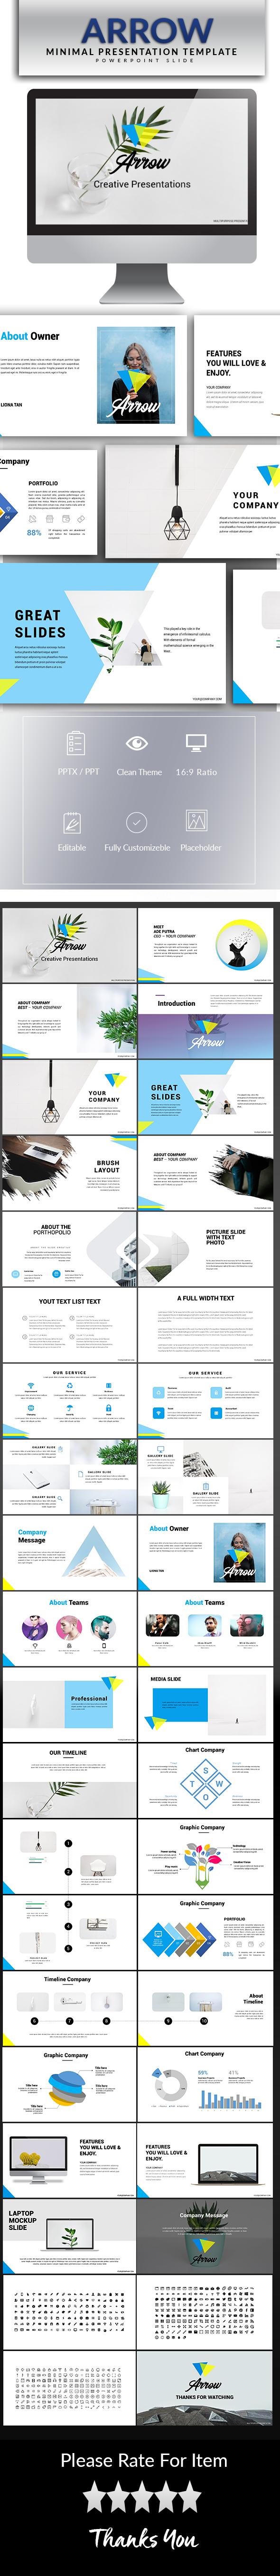 Arrow Powerpoint Template - PowerPoint Templates Presentation Templates